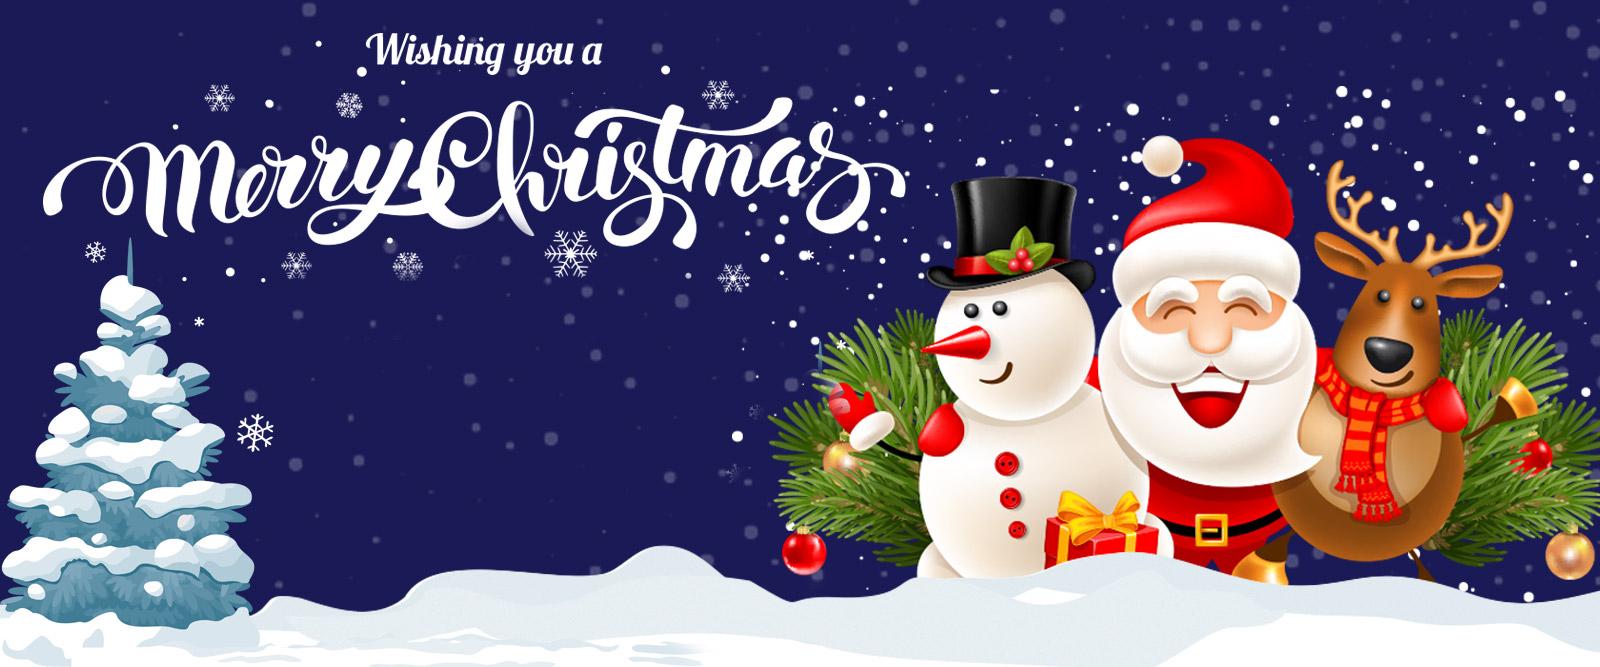 Christmas Social Media Assets